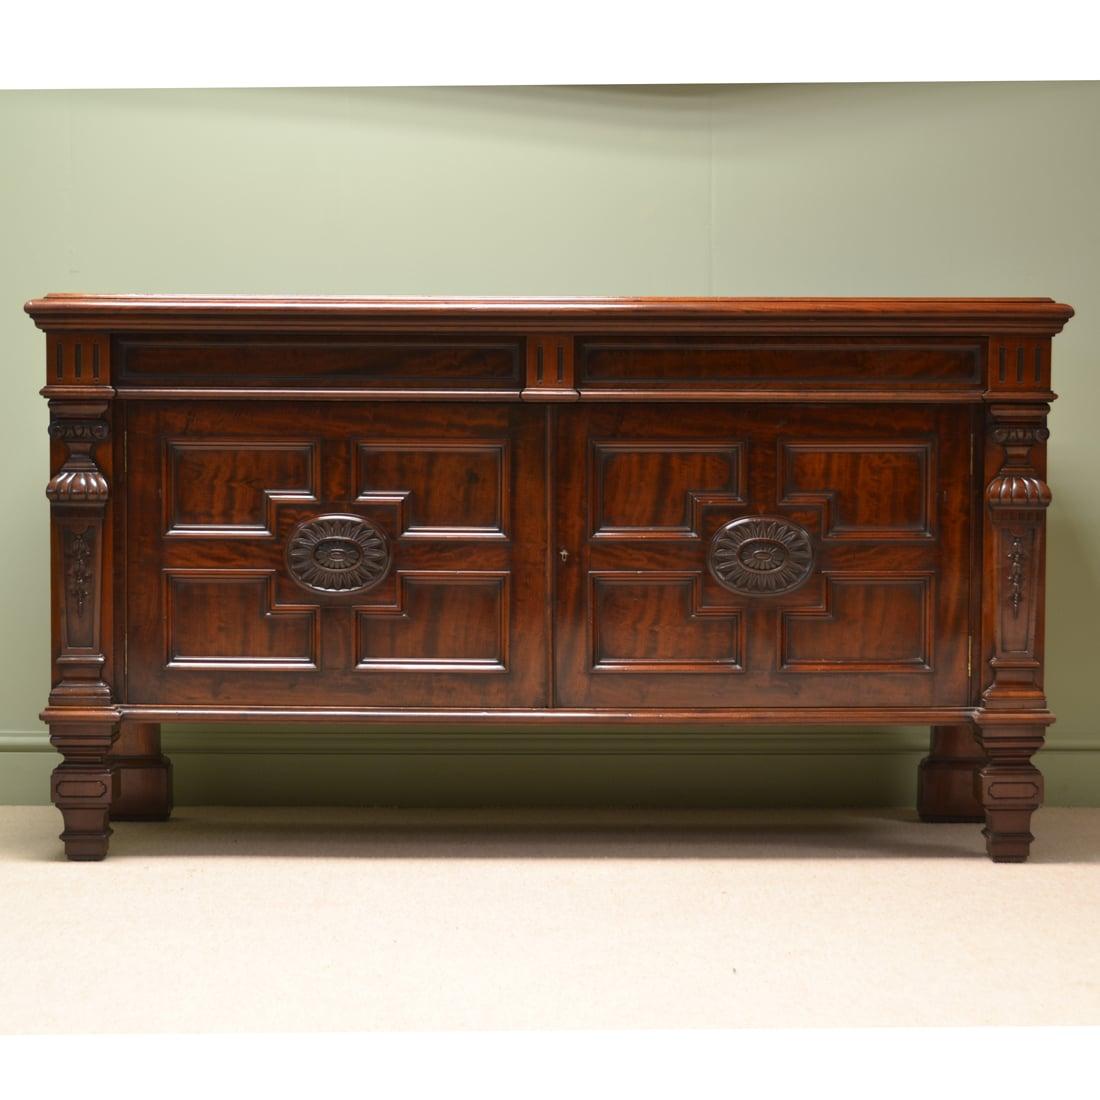 Antique Vintage Furniture: Maple & Co Antique Furniture